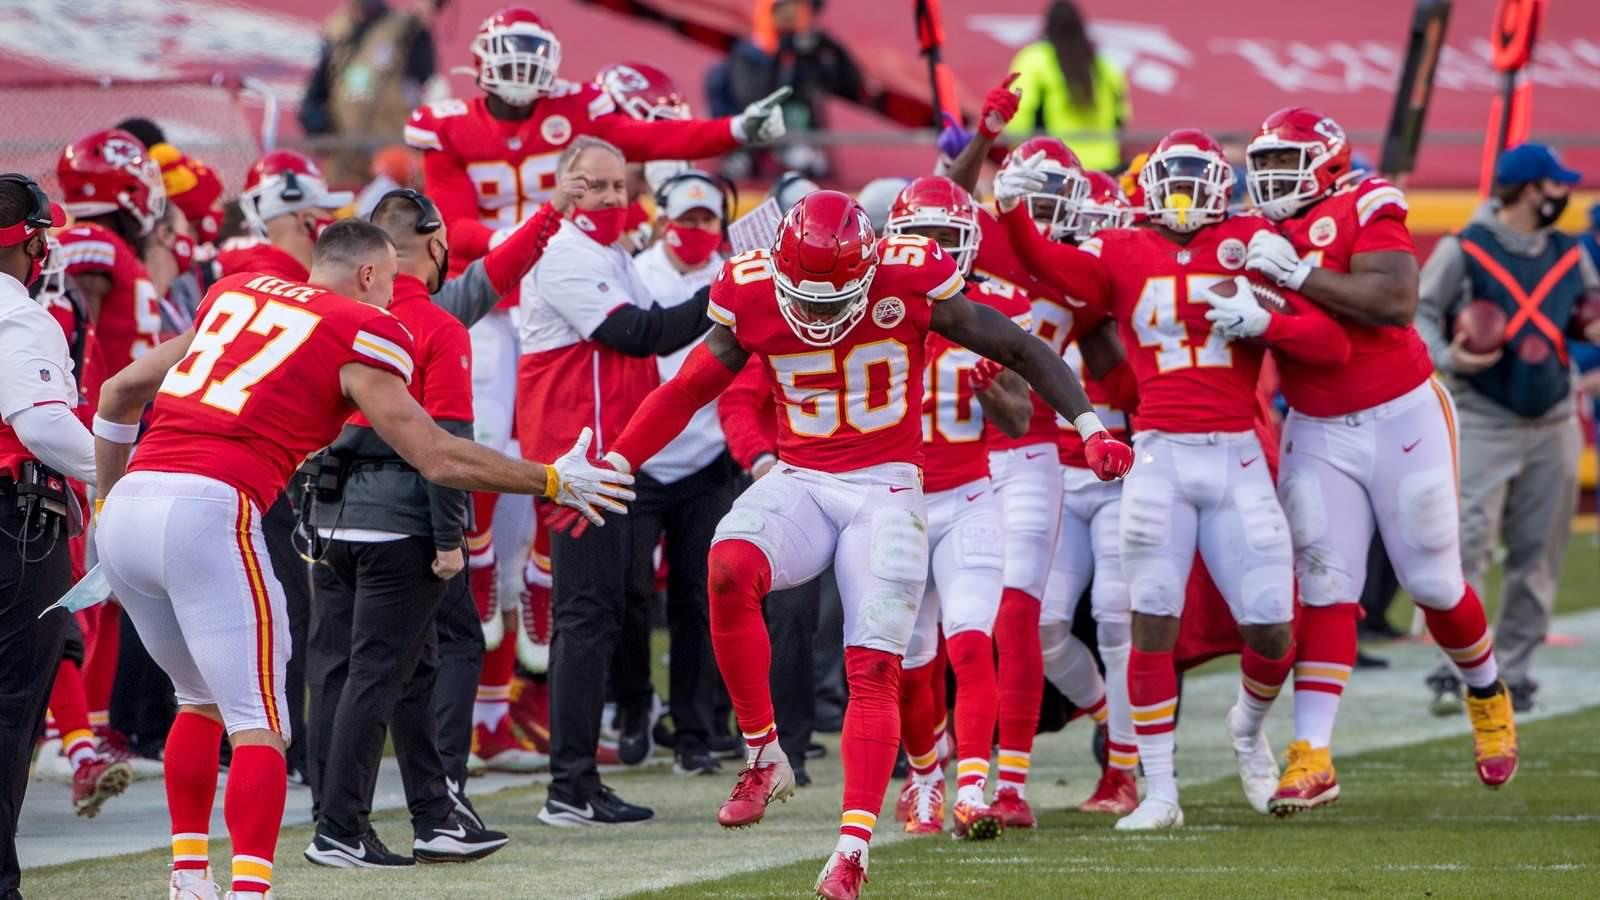 NFL: Kansas City Chiefs extraem vitória recorde